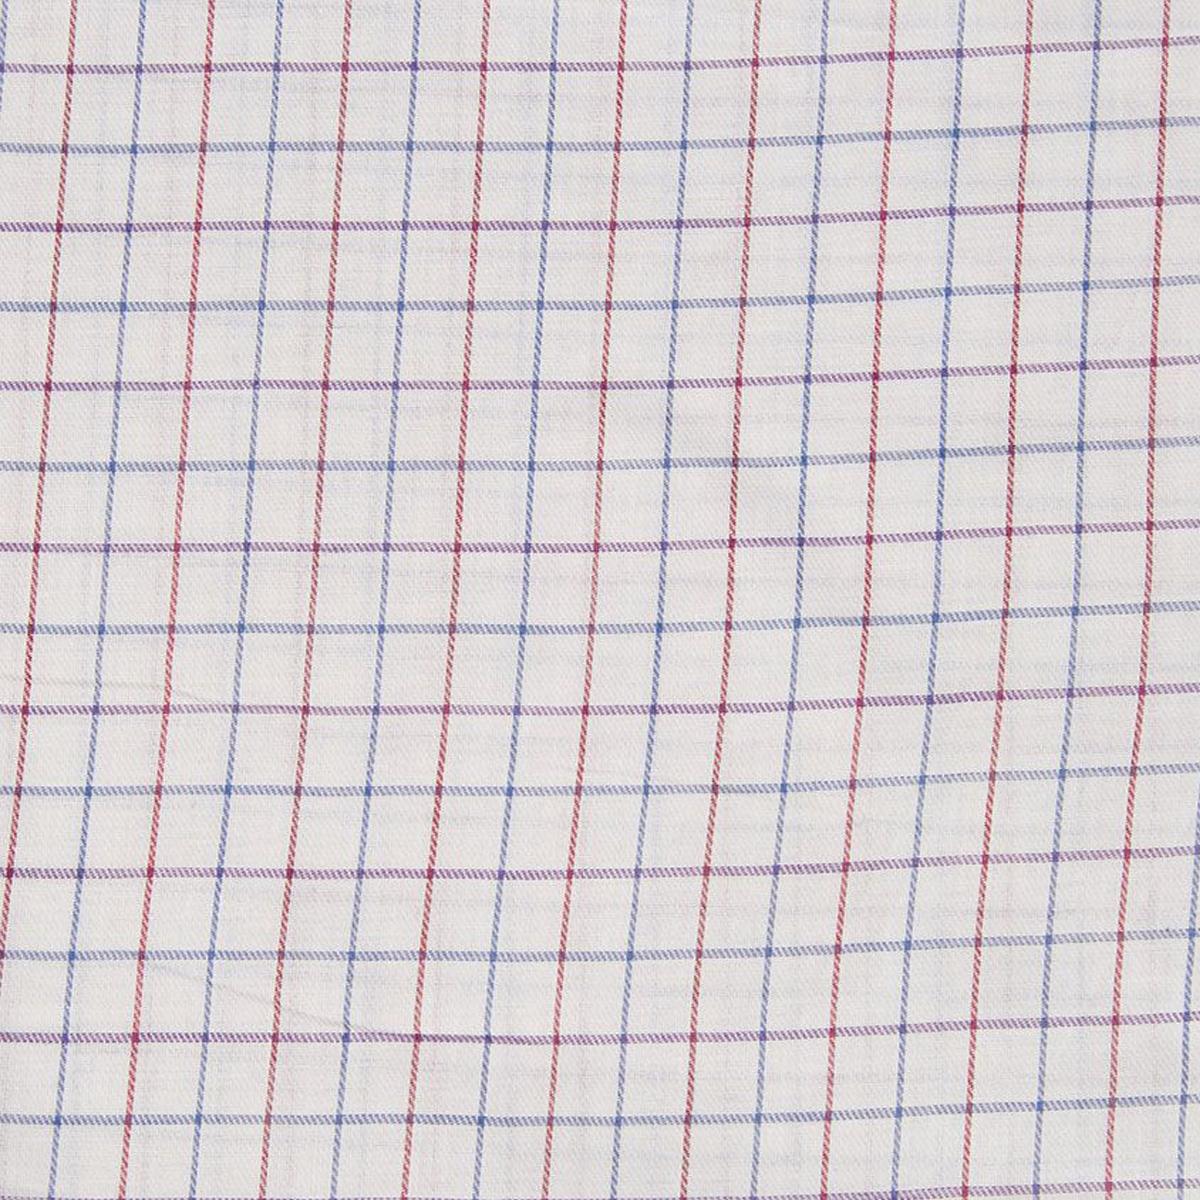 Barbour Handkerchief Gift Box Set – Tattersall Assortment